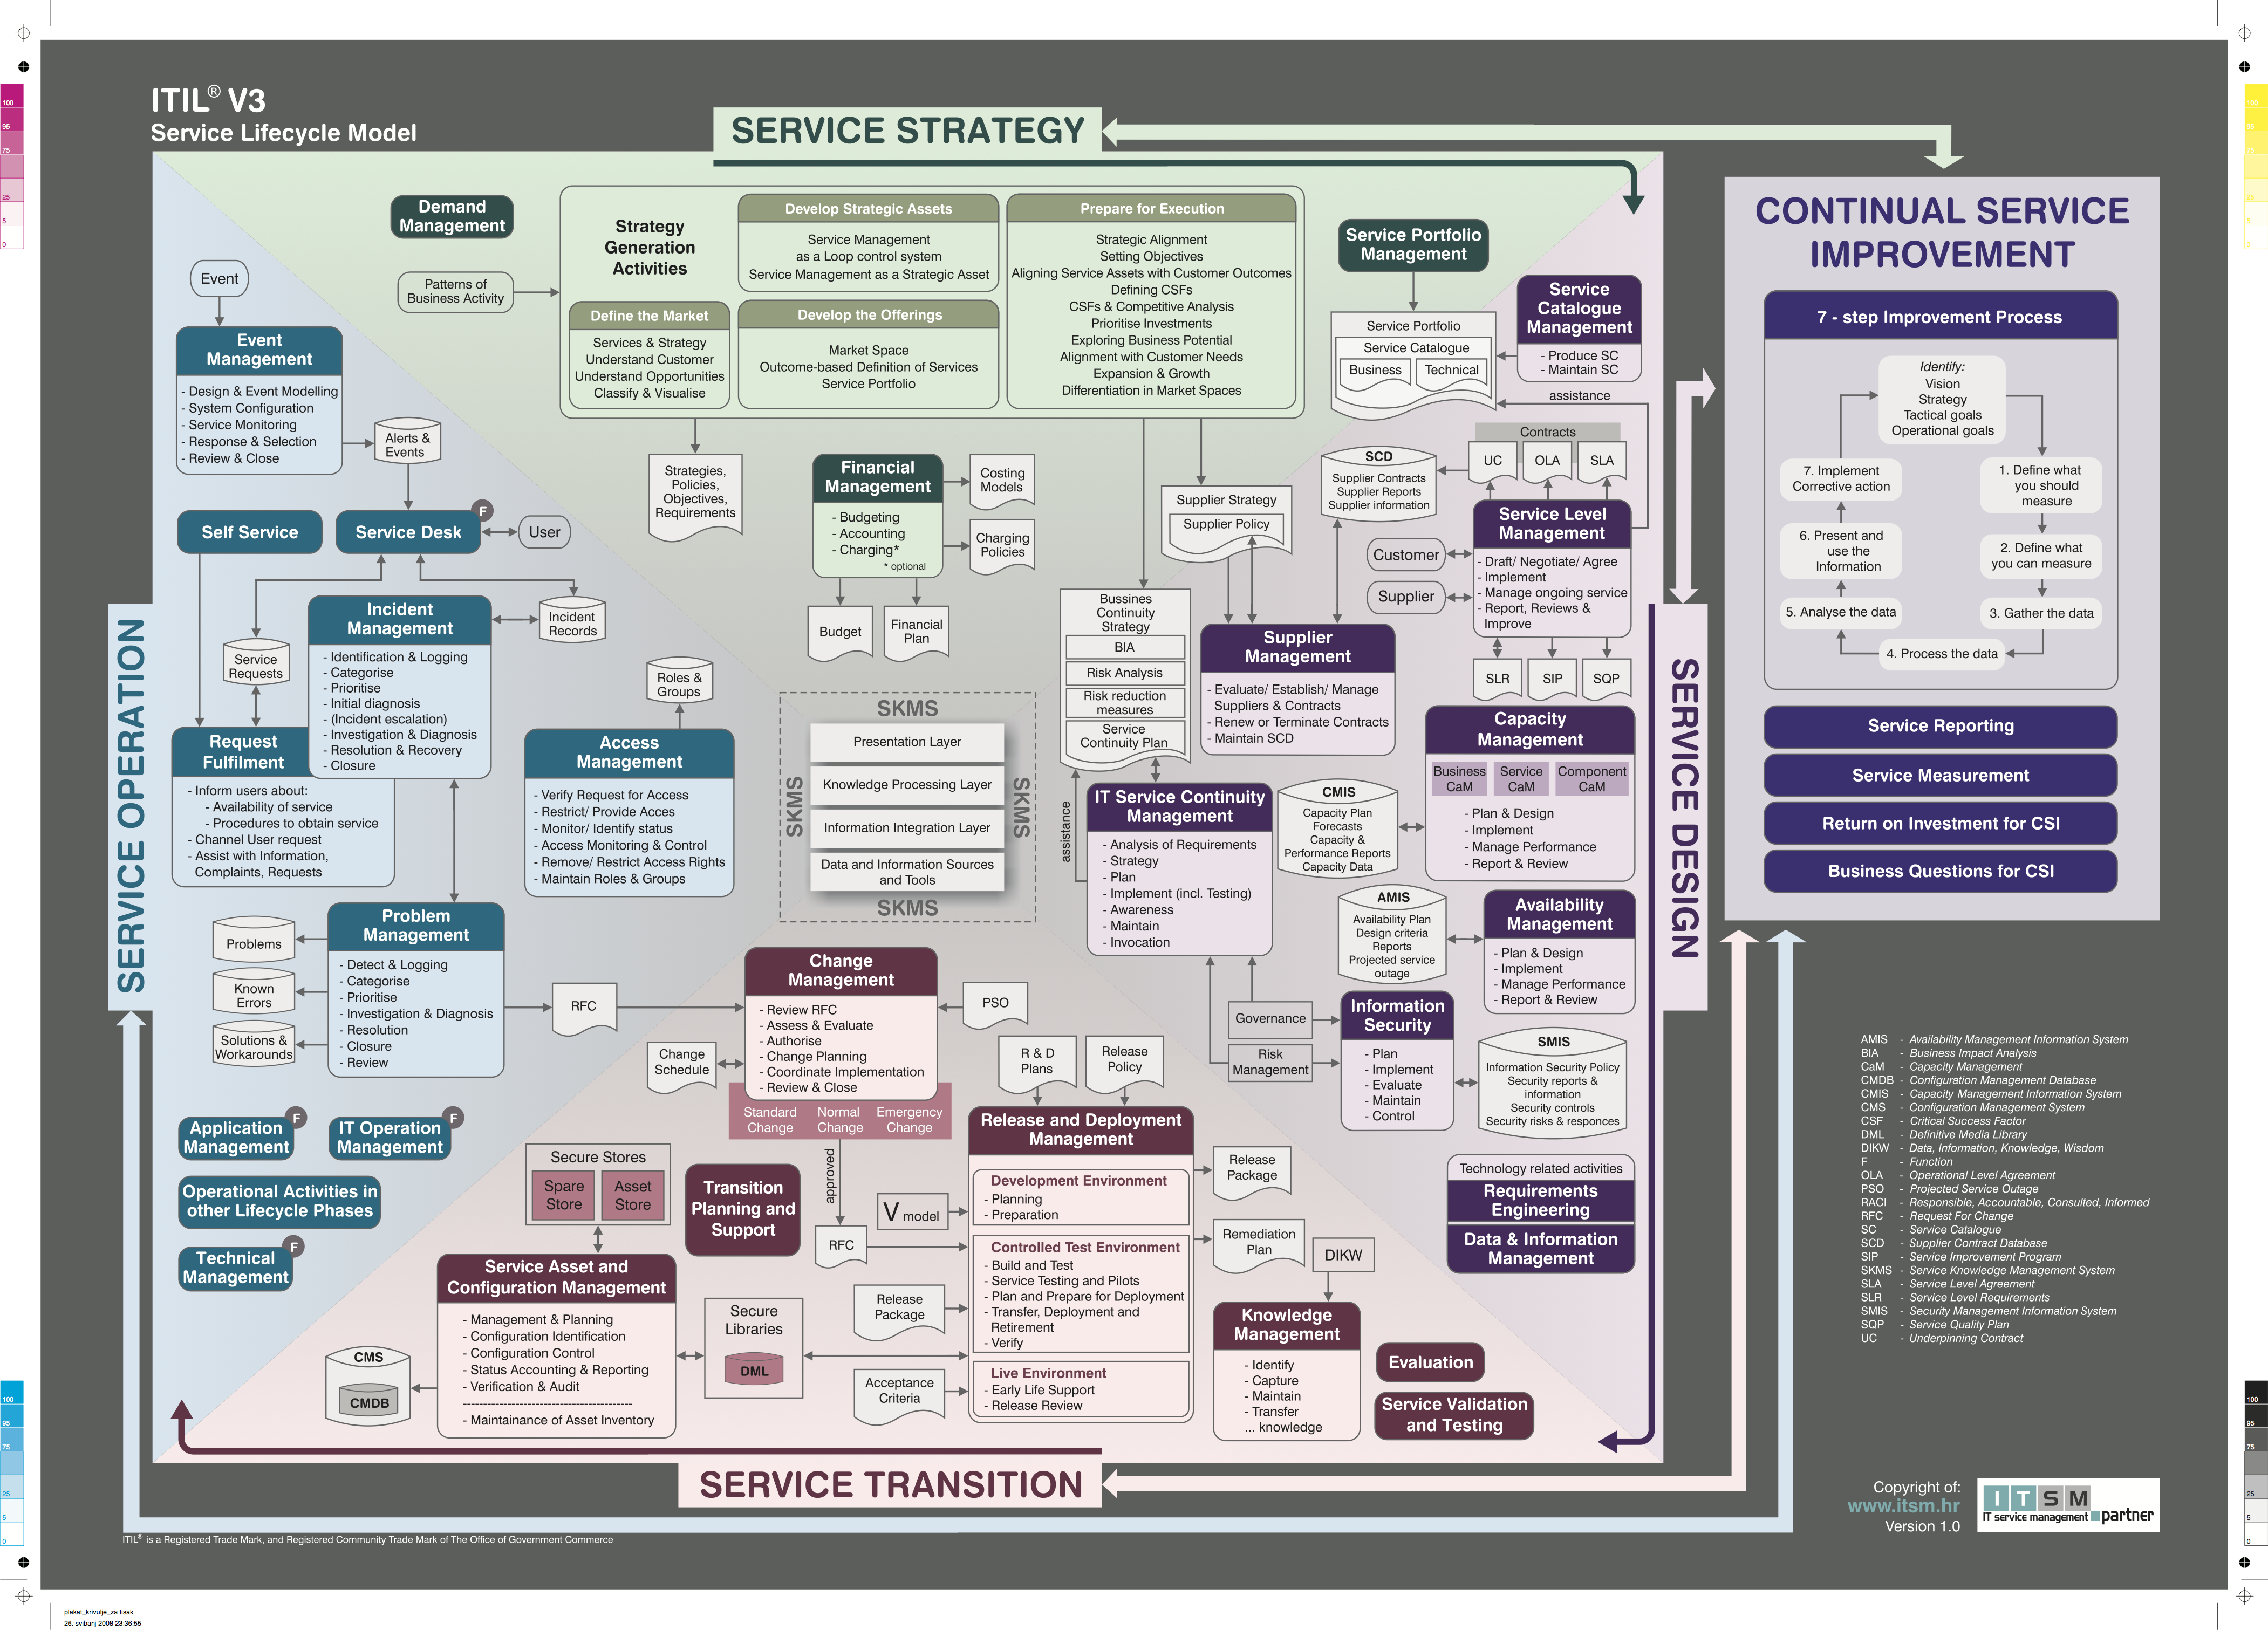 The ITIL V3 Service Lifecycle Model Tecnologia da